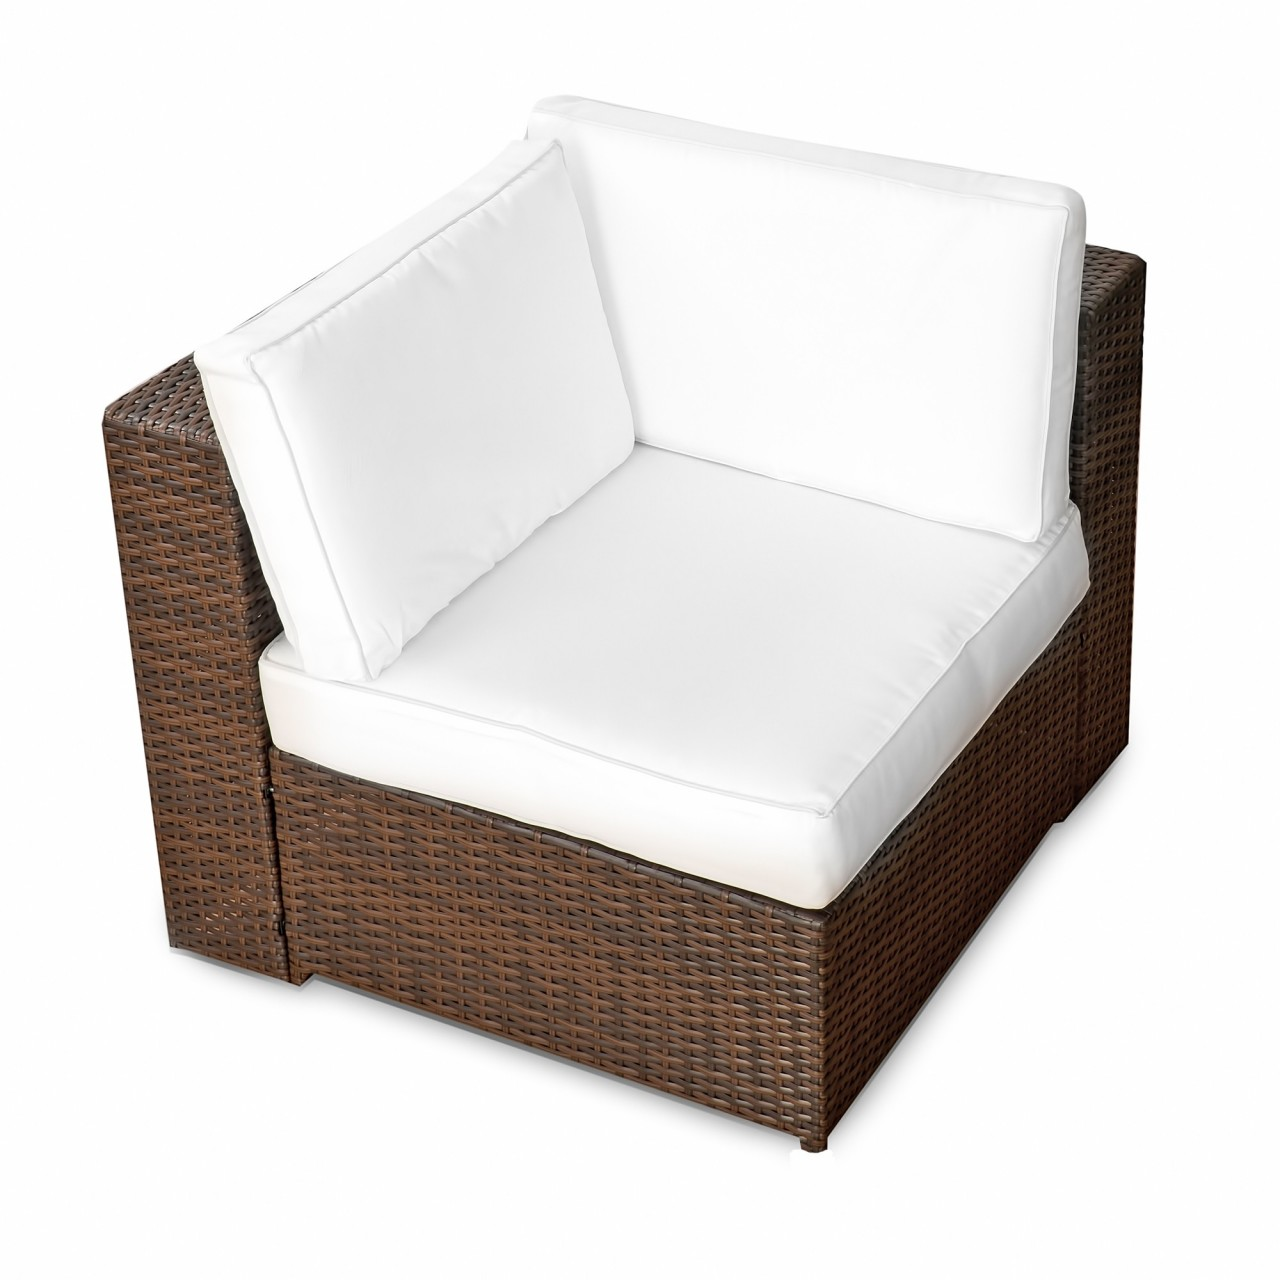 Loungesessel braun  Rattan Lounge Sessel ▻ günstig ◅ Loungesessel Rattan kaufen